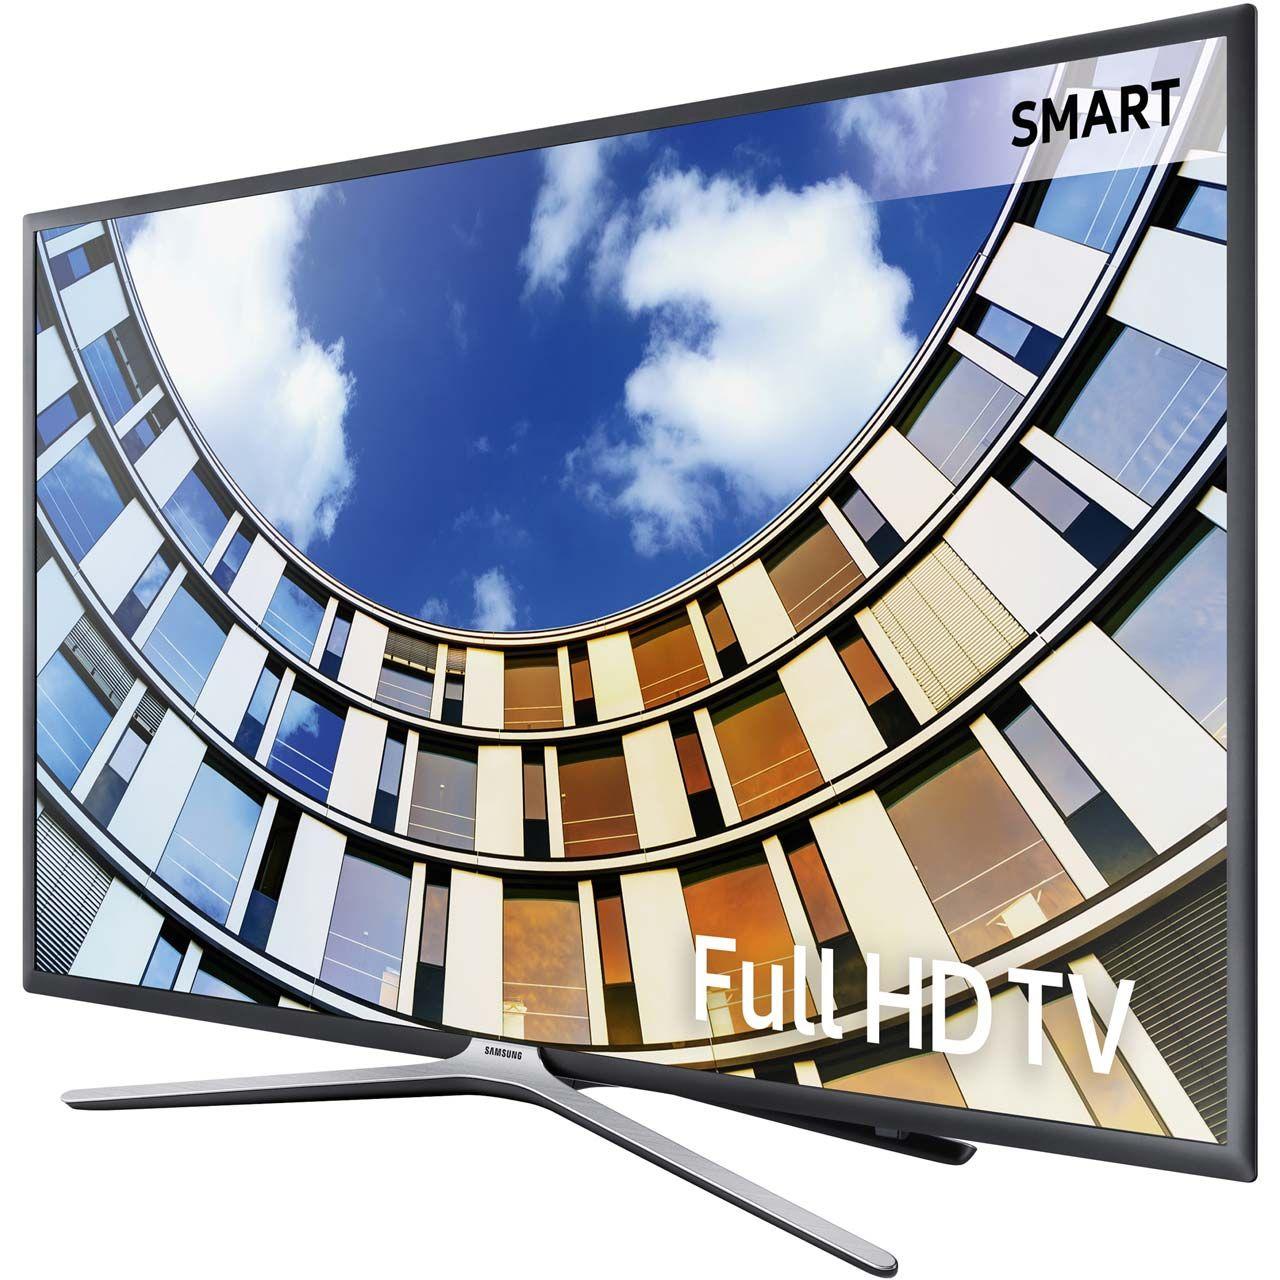 UE32M5500 32inch Samsung LED TV Smart tv, Led